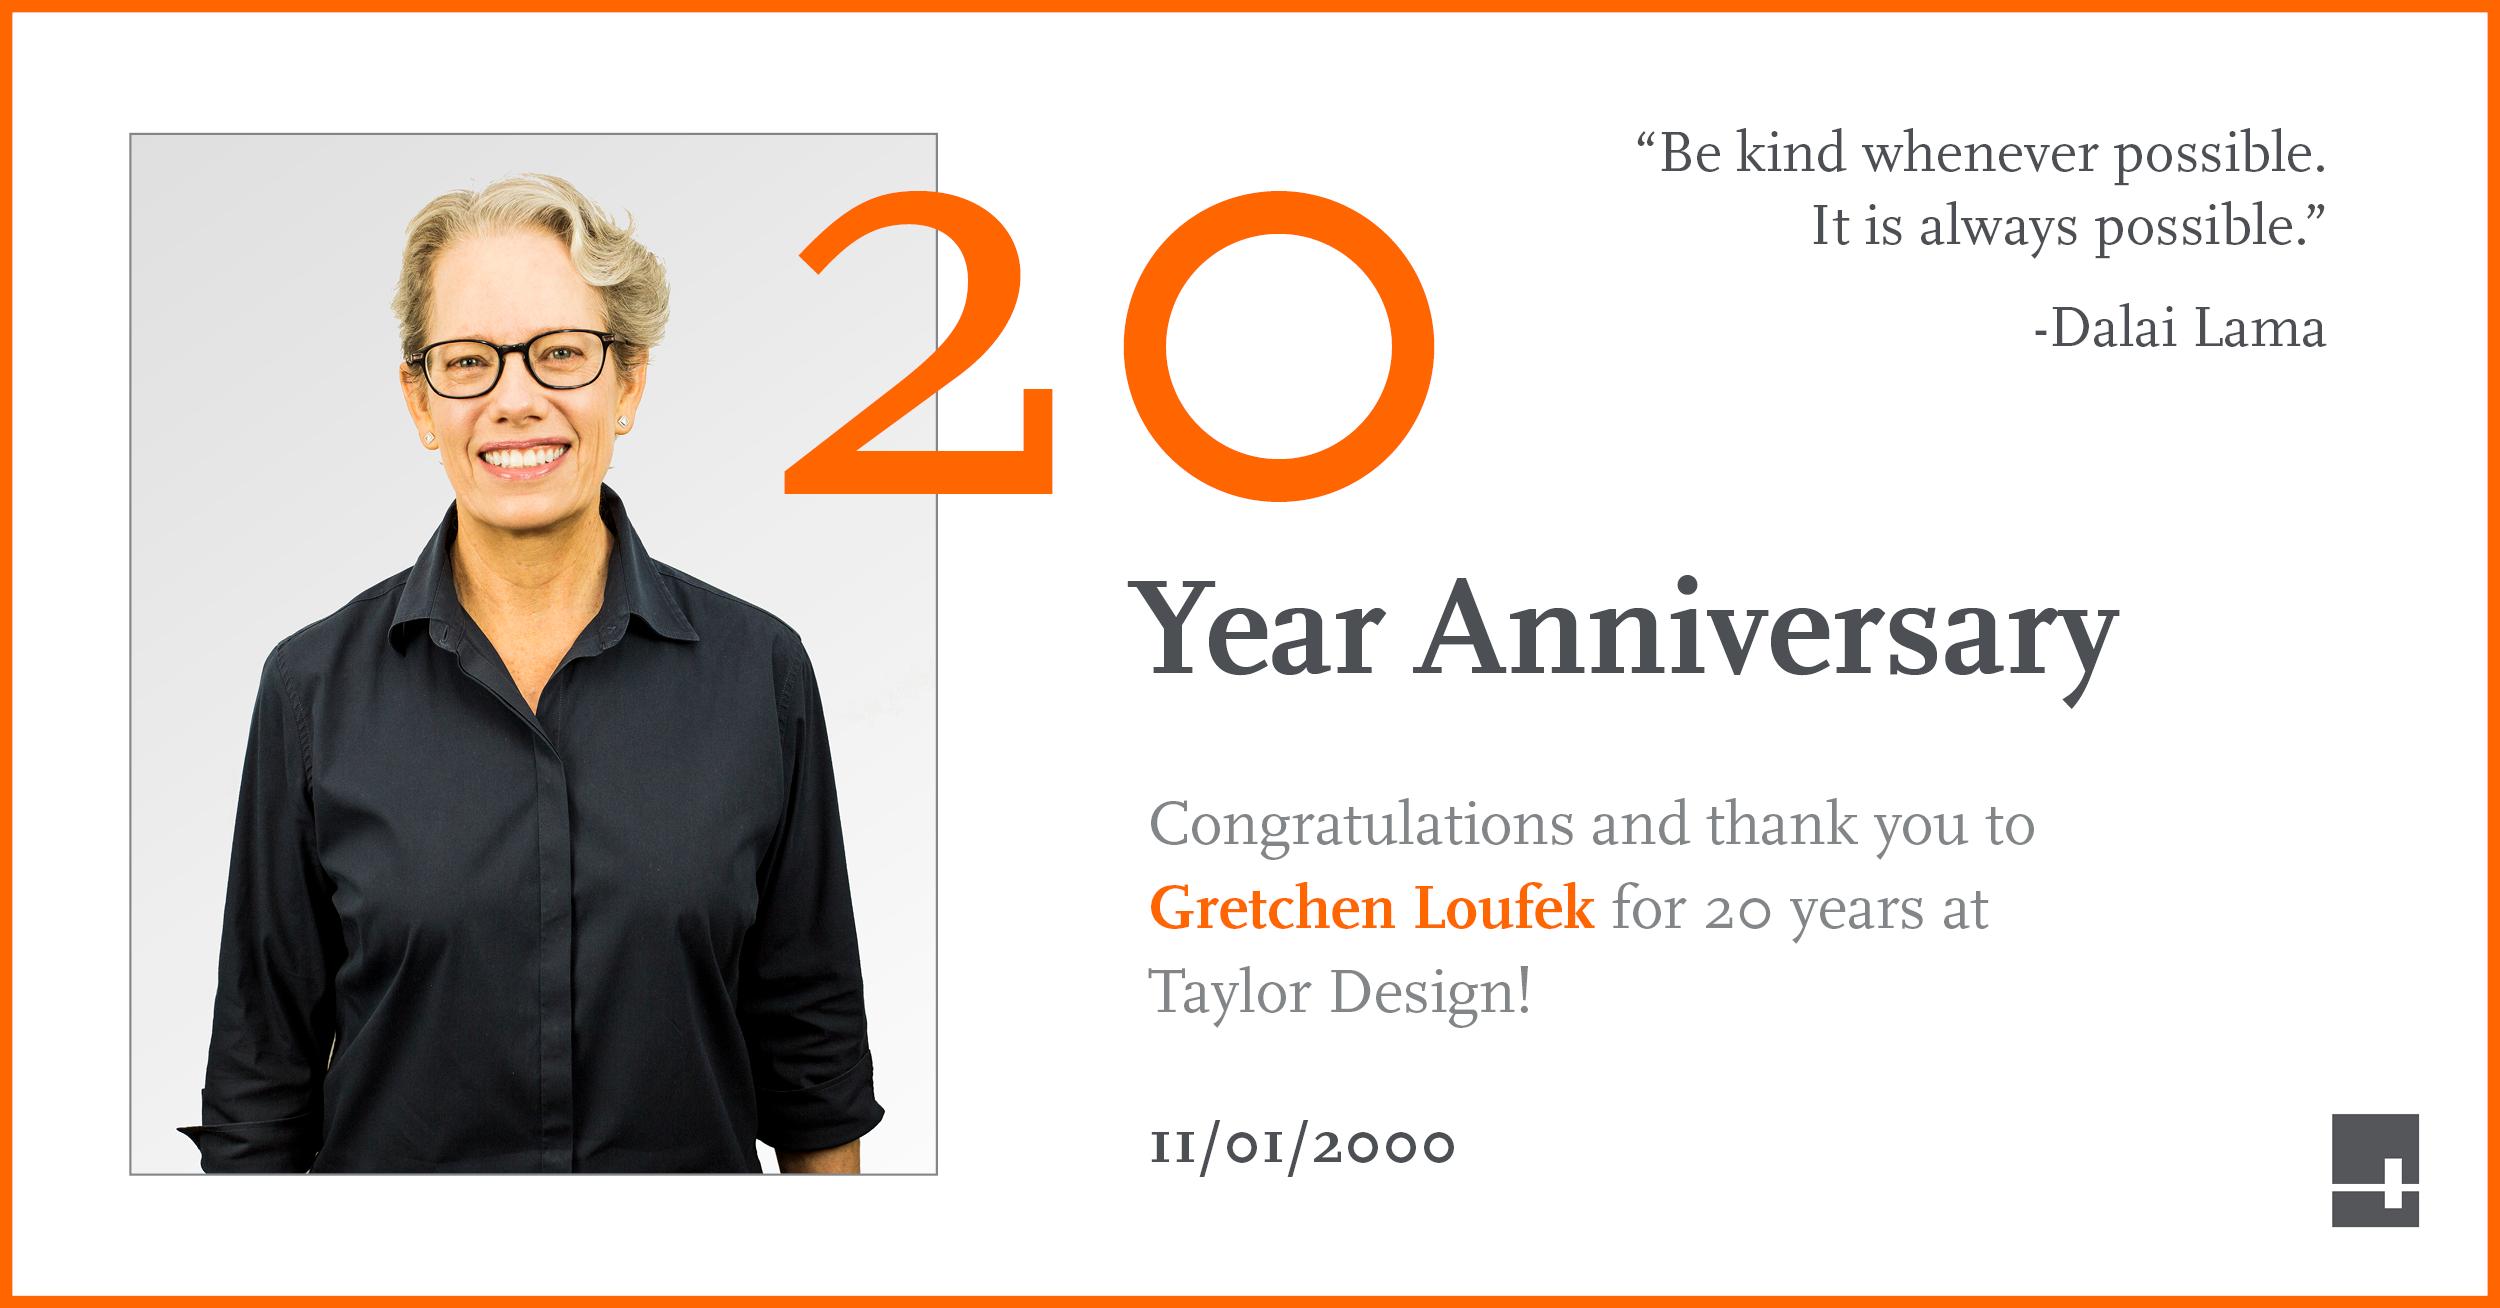 Gretchen Loufek celebrating 20 years at Taylor Design